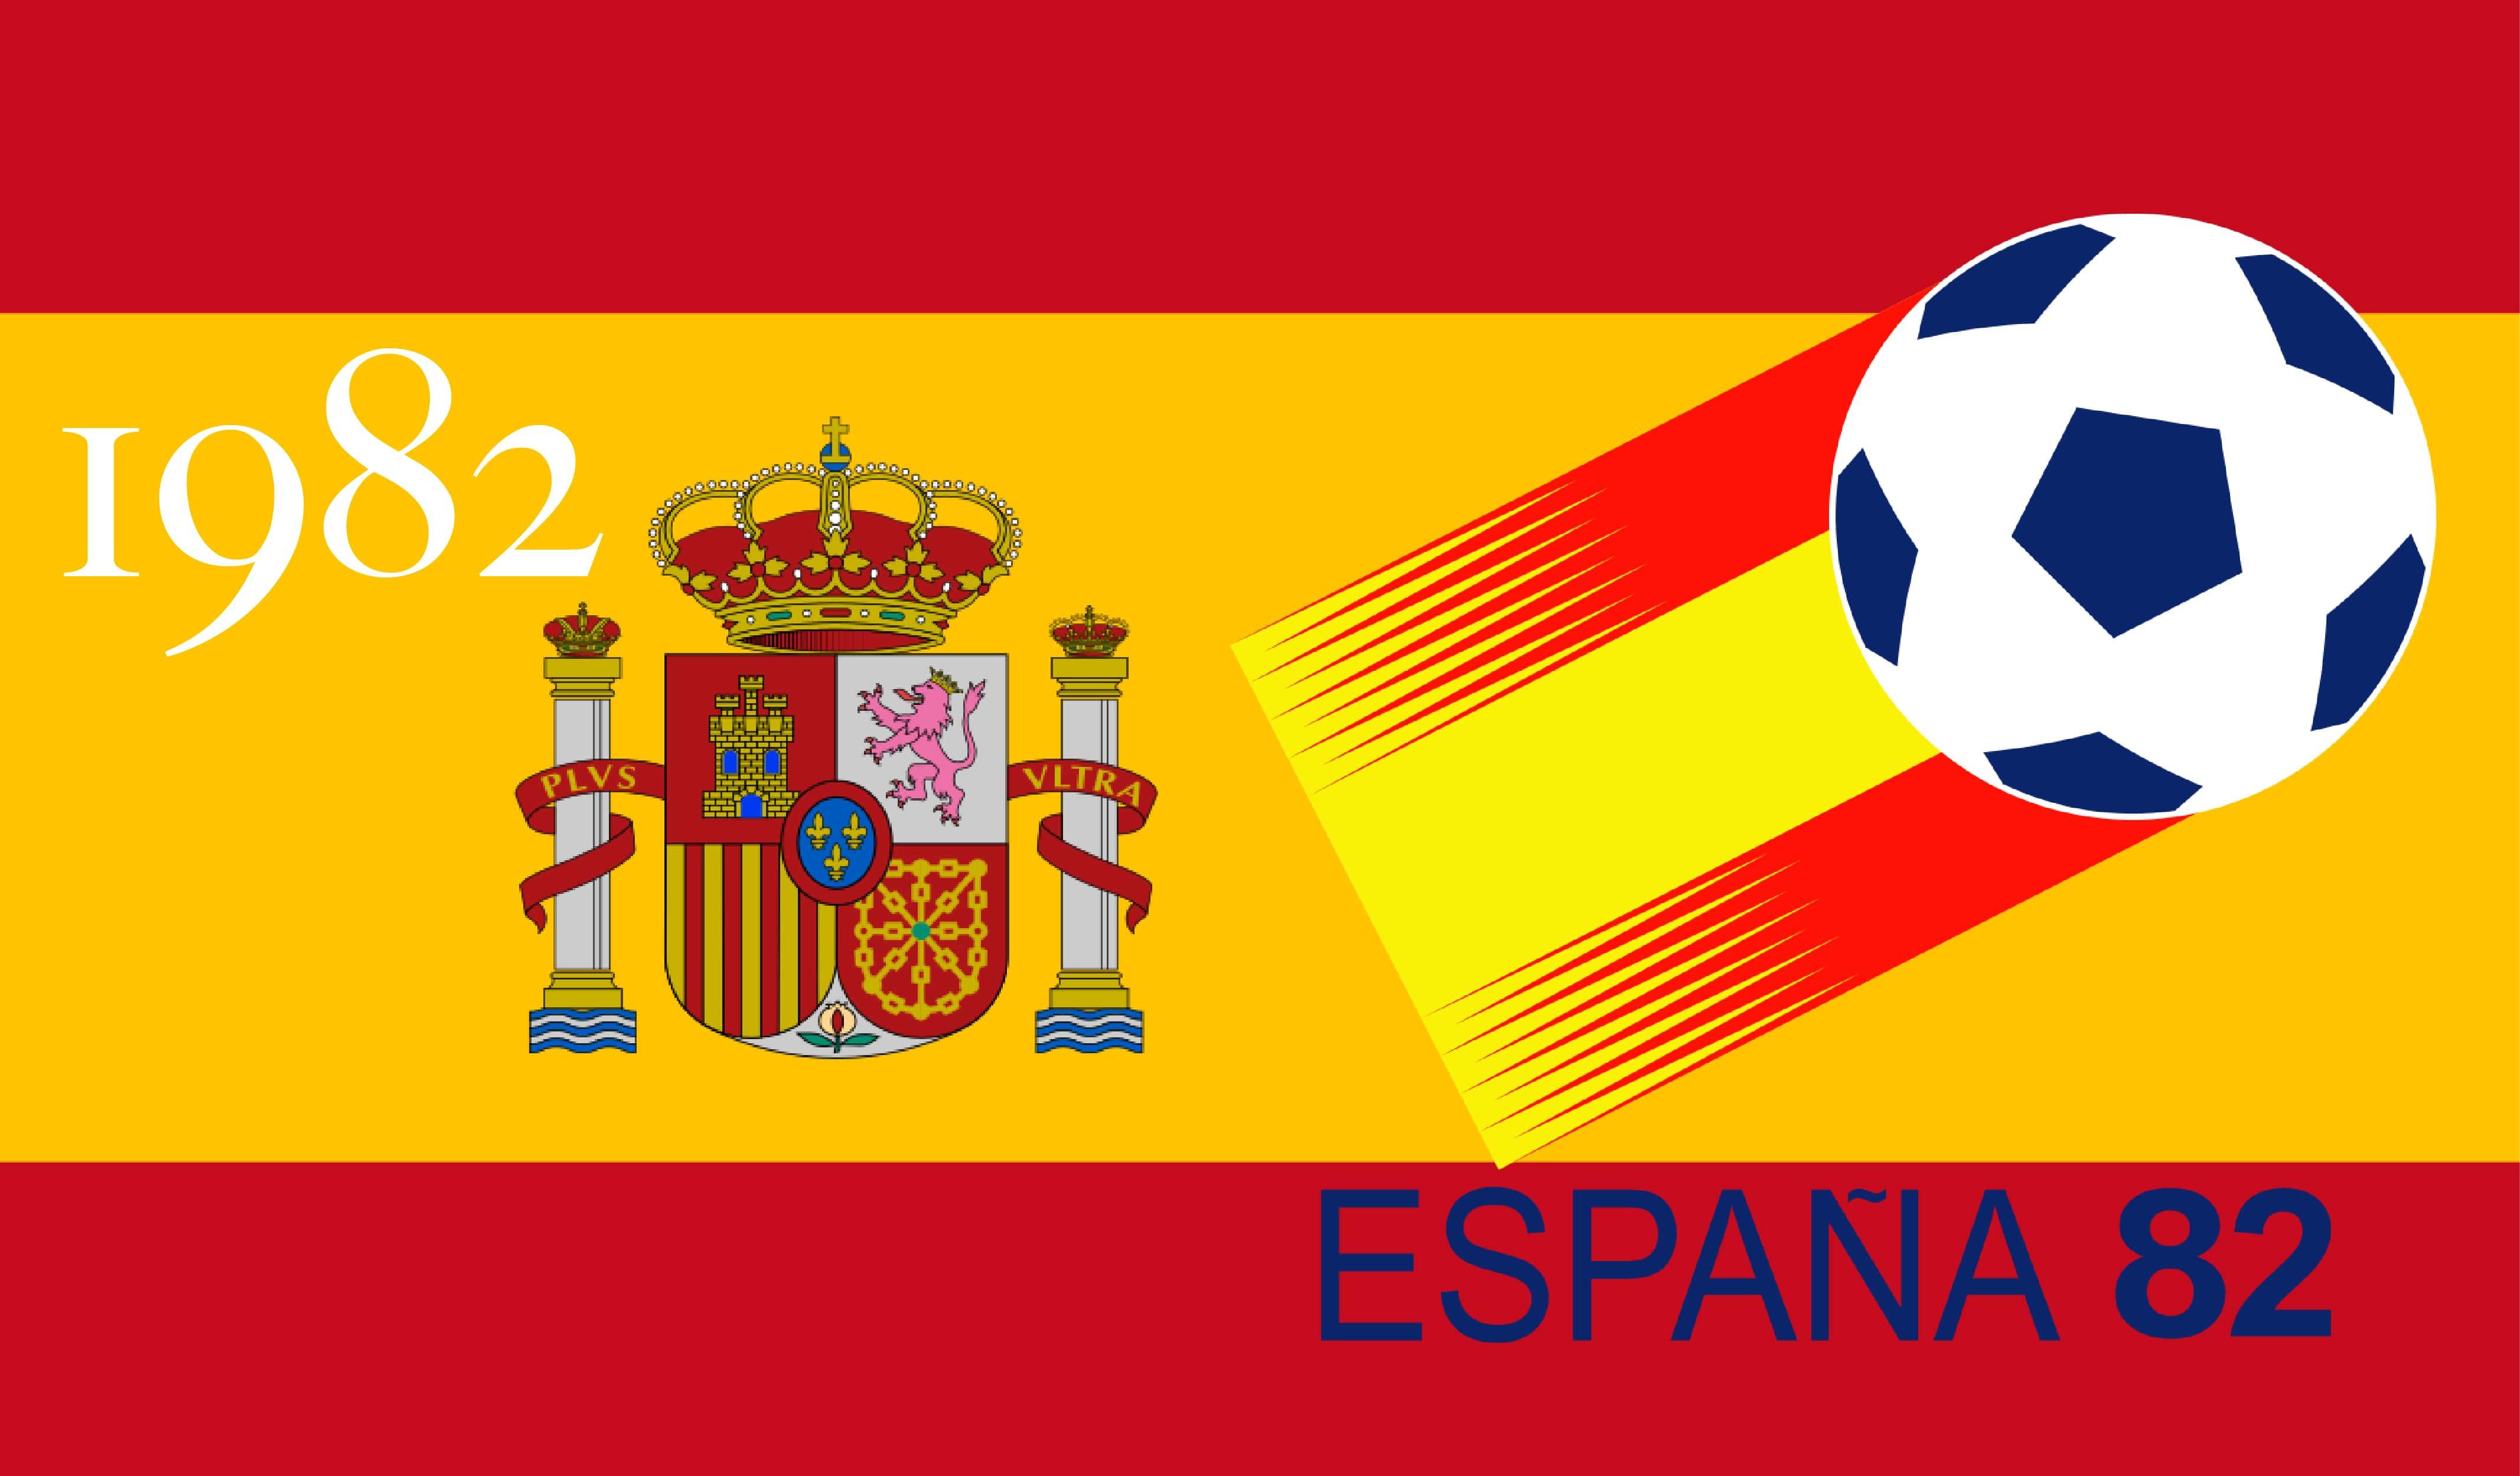 world cup espana